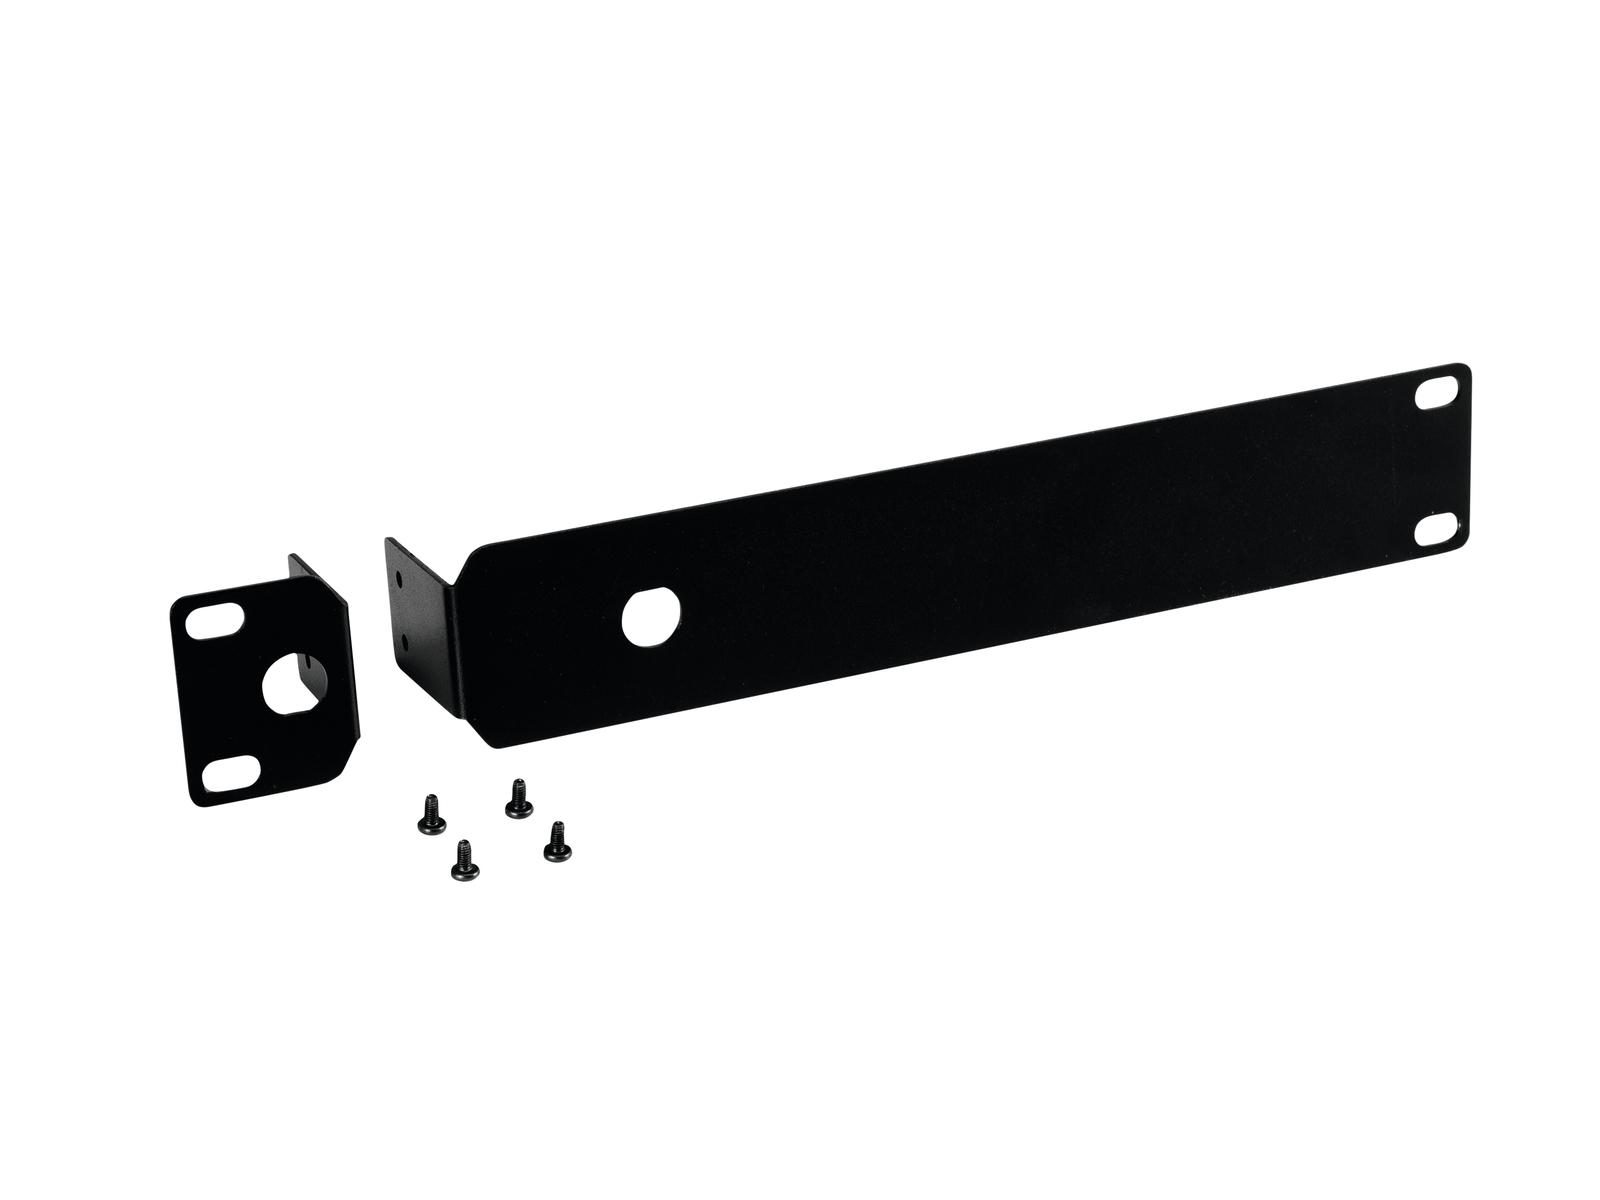 OMNITRONIC UHF-100 RM-1 Kit per montaggio in Rack per 1x UHF-101/UHF-102